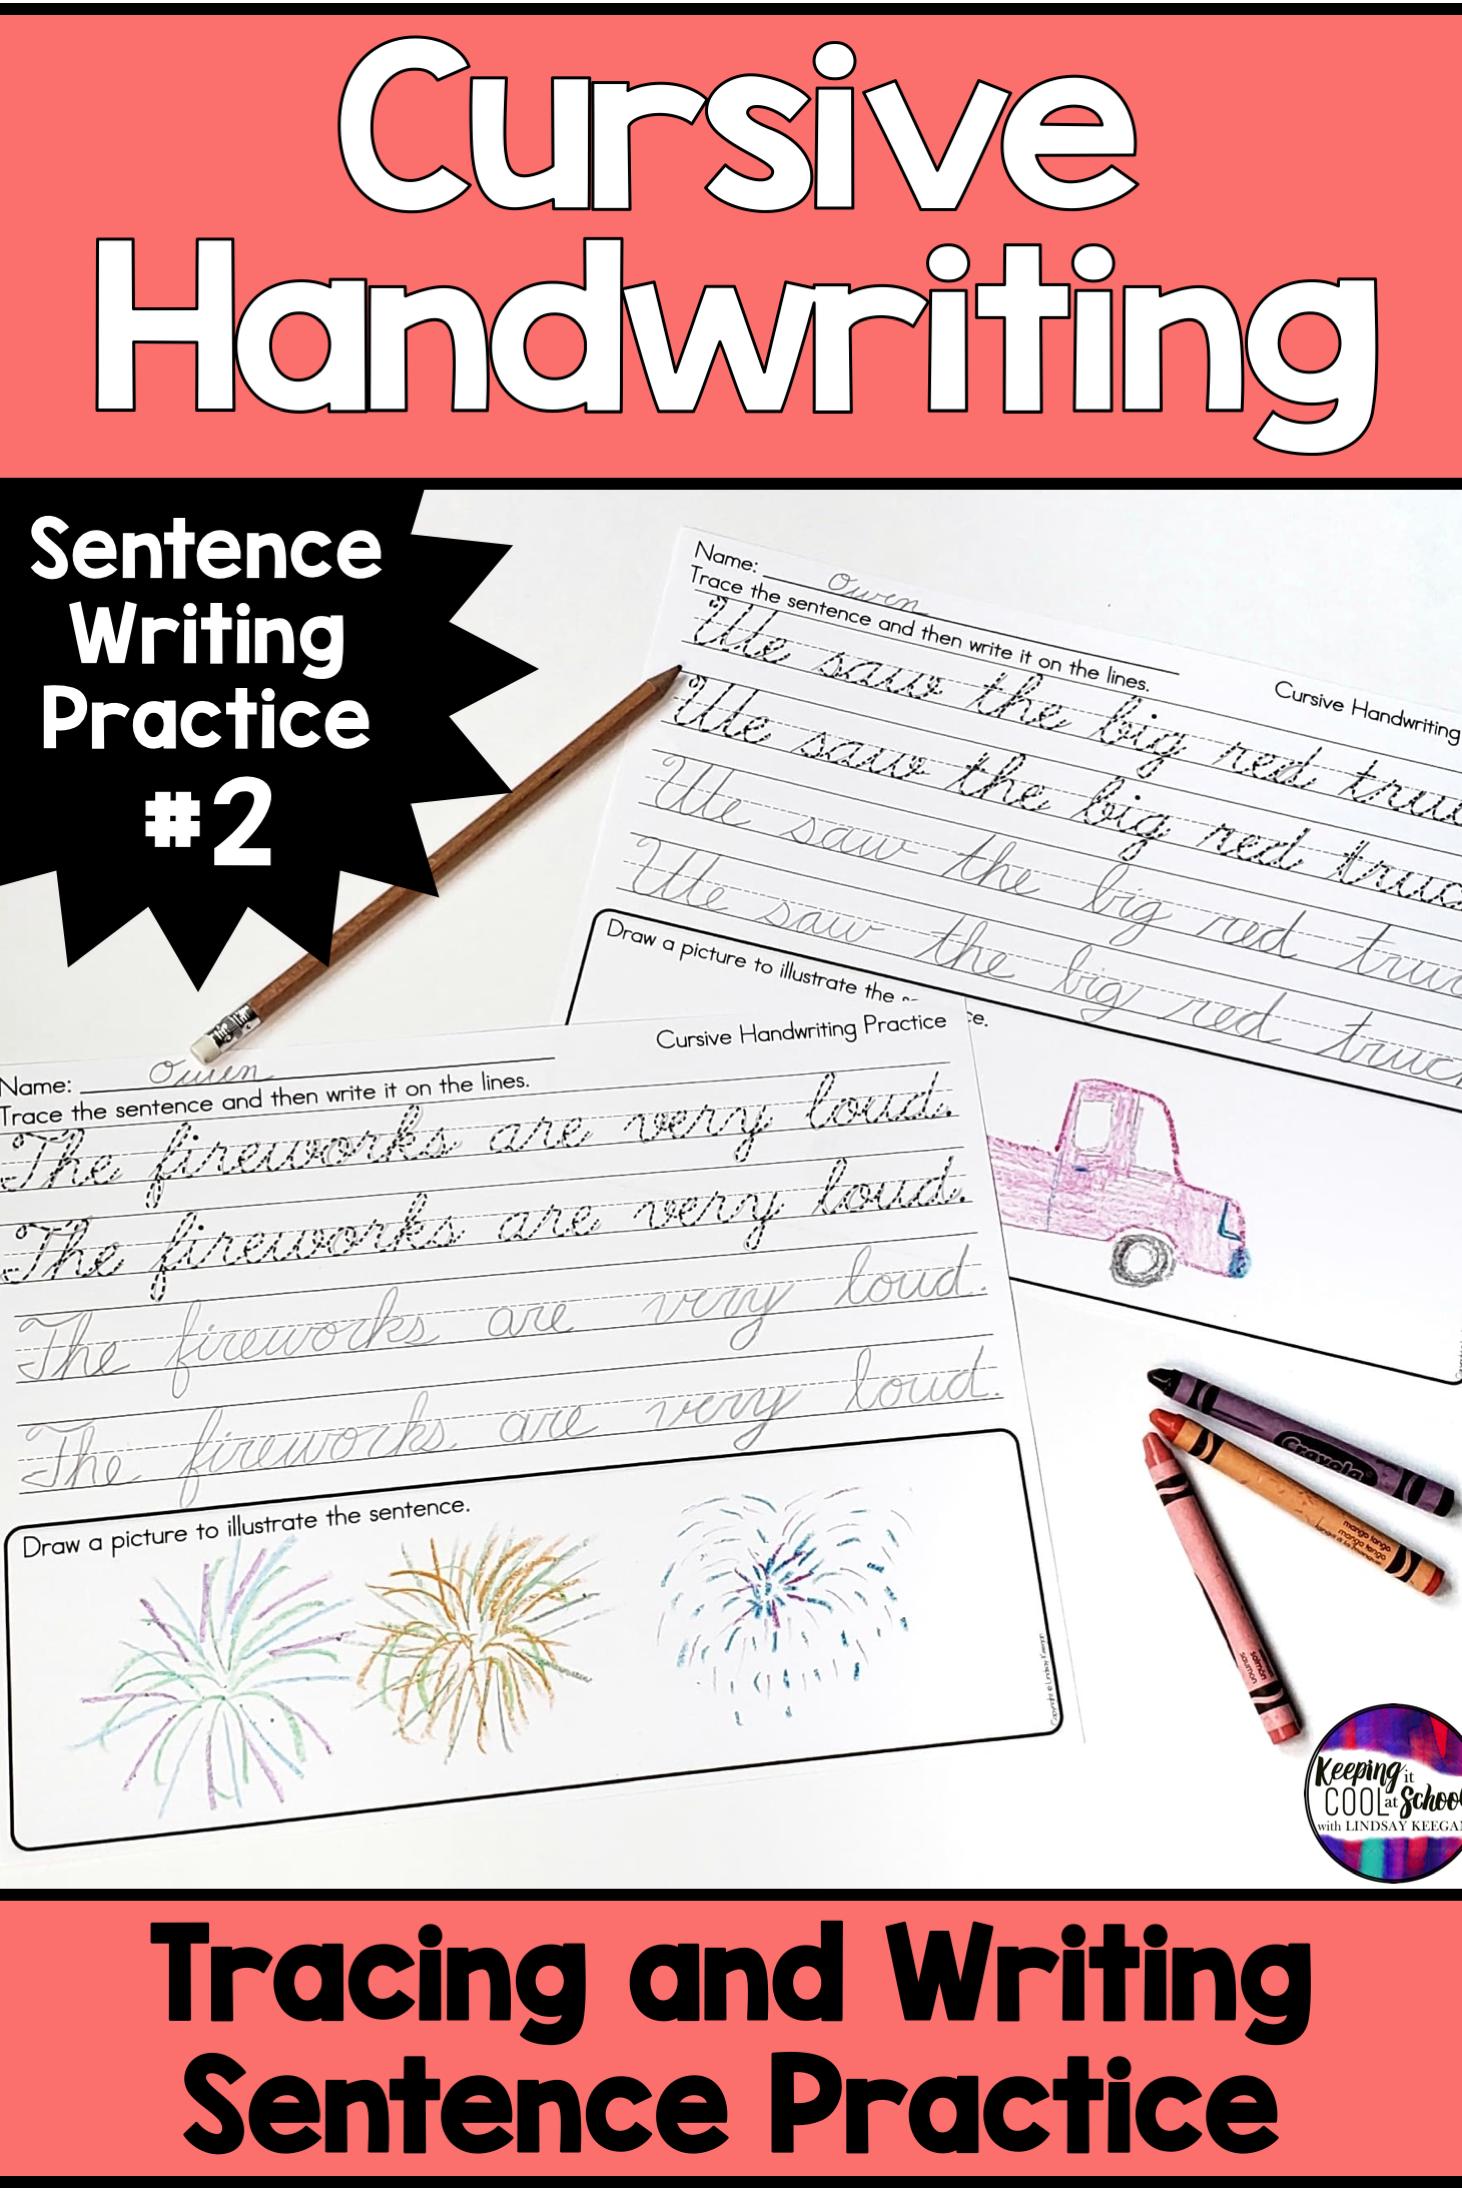 Cursive Handwriting Sentence Practice Cursive Handwriting Practice Handwriting Practice Sentences Learn Handwriting [ 2193 x 1462 Pixel ]